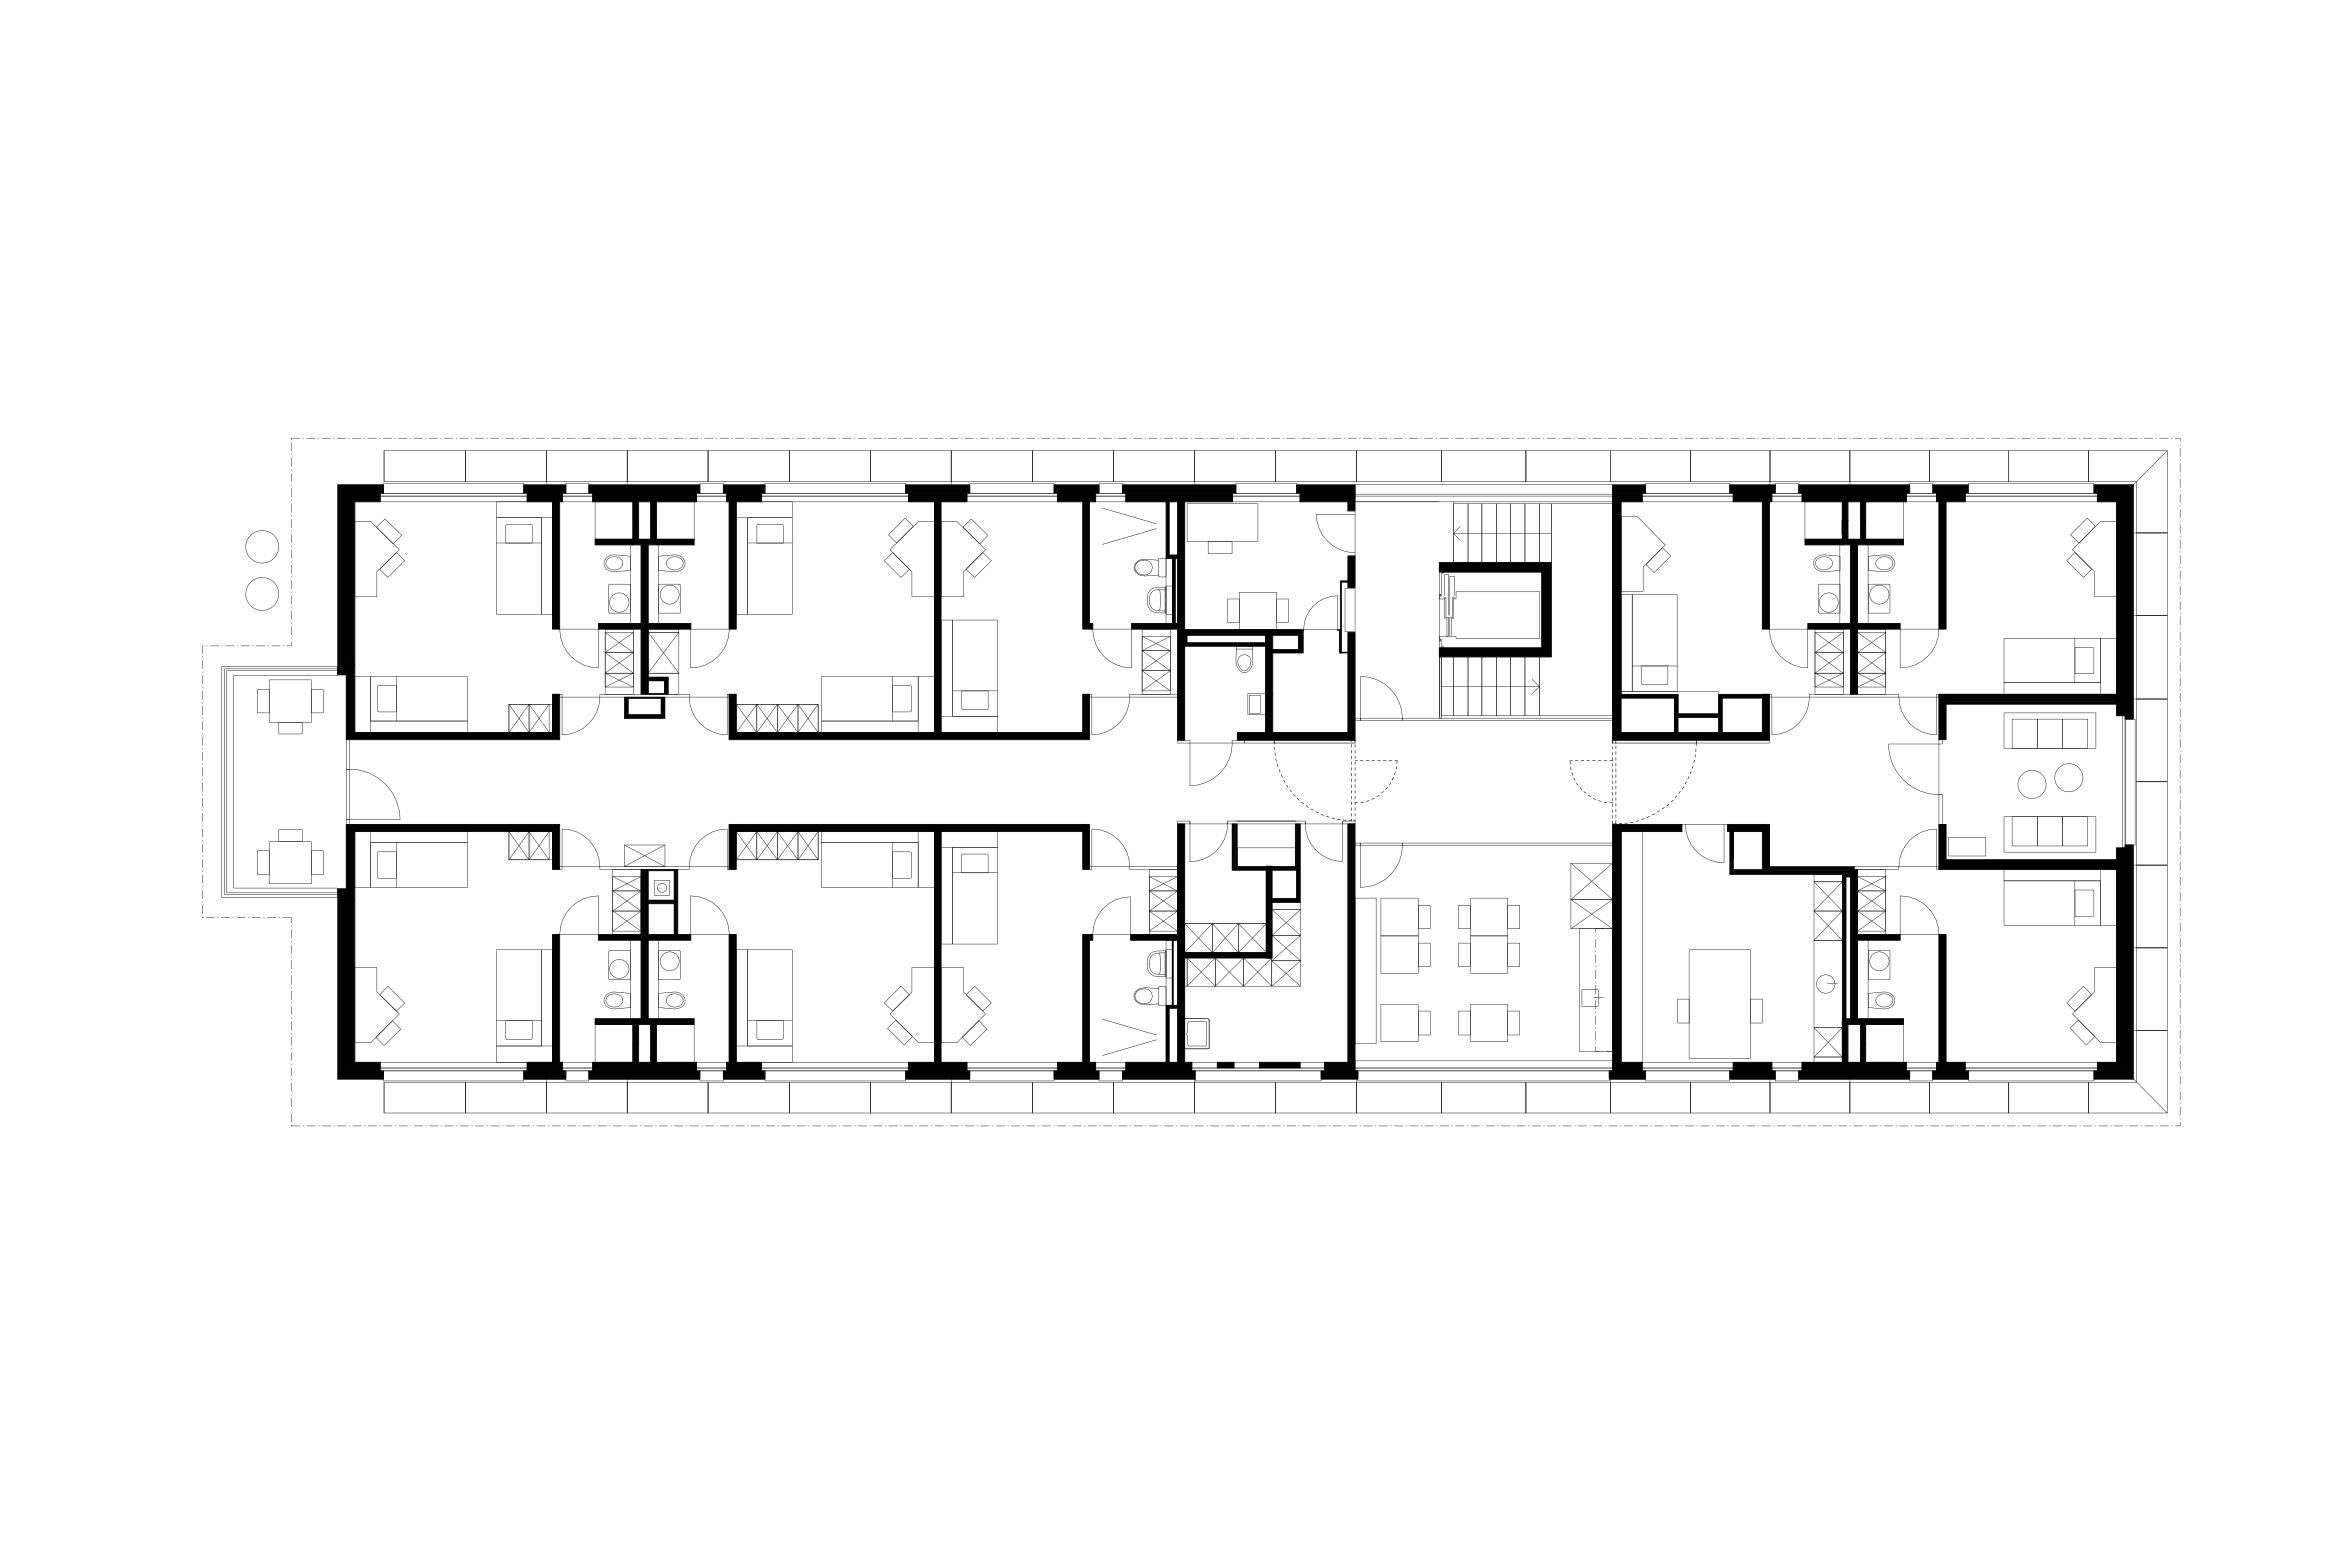 413 3 4 Birken Haus Obergeschoss